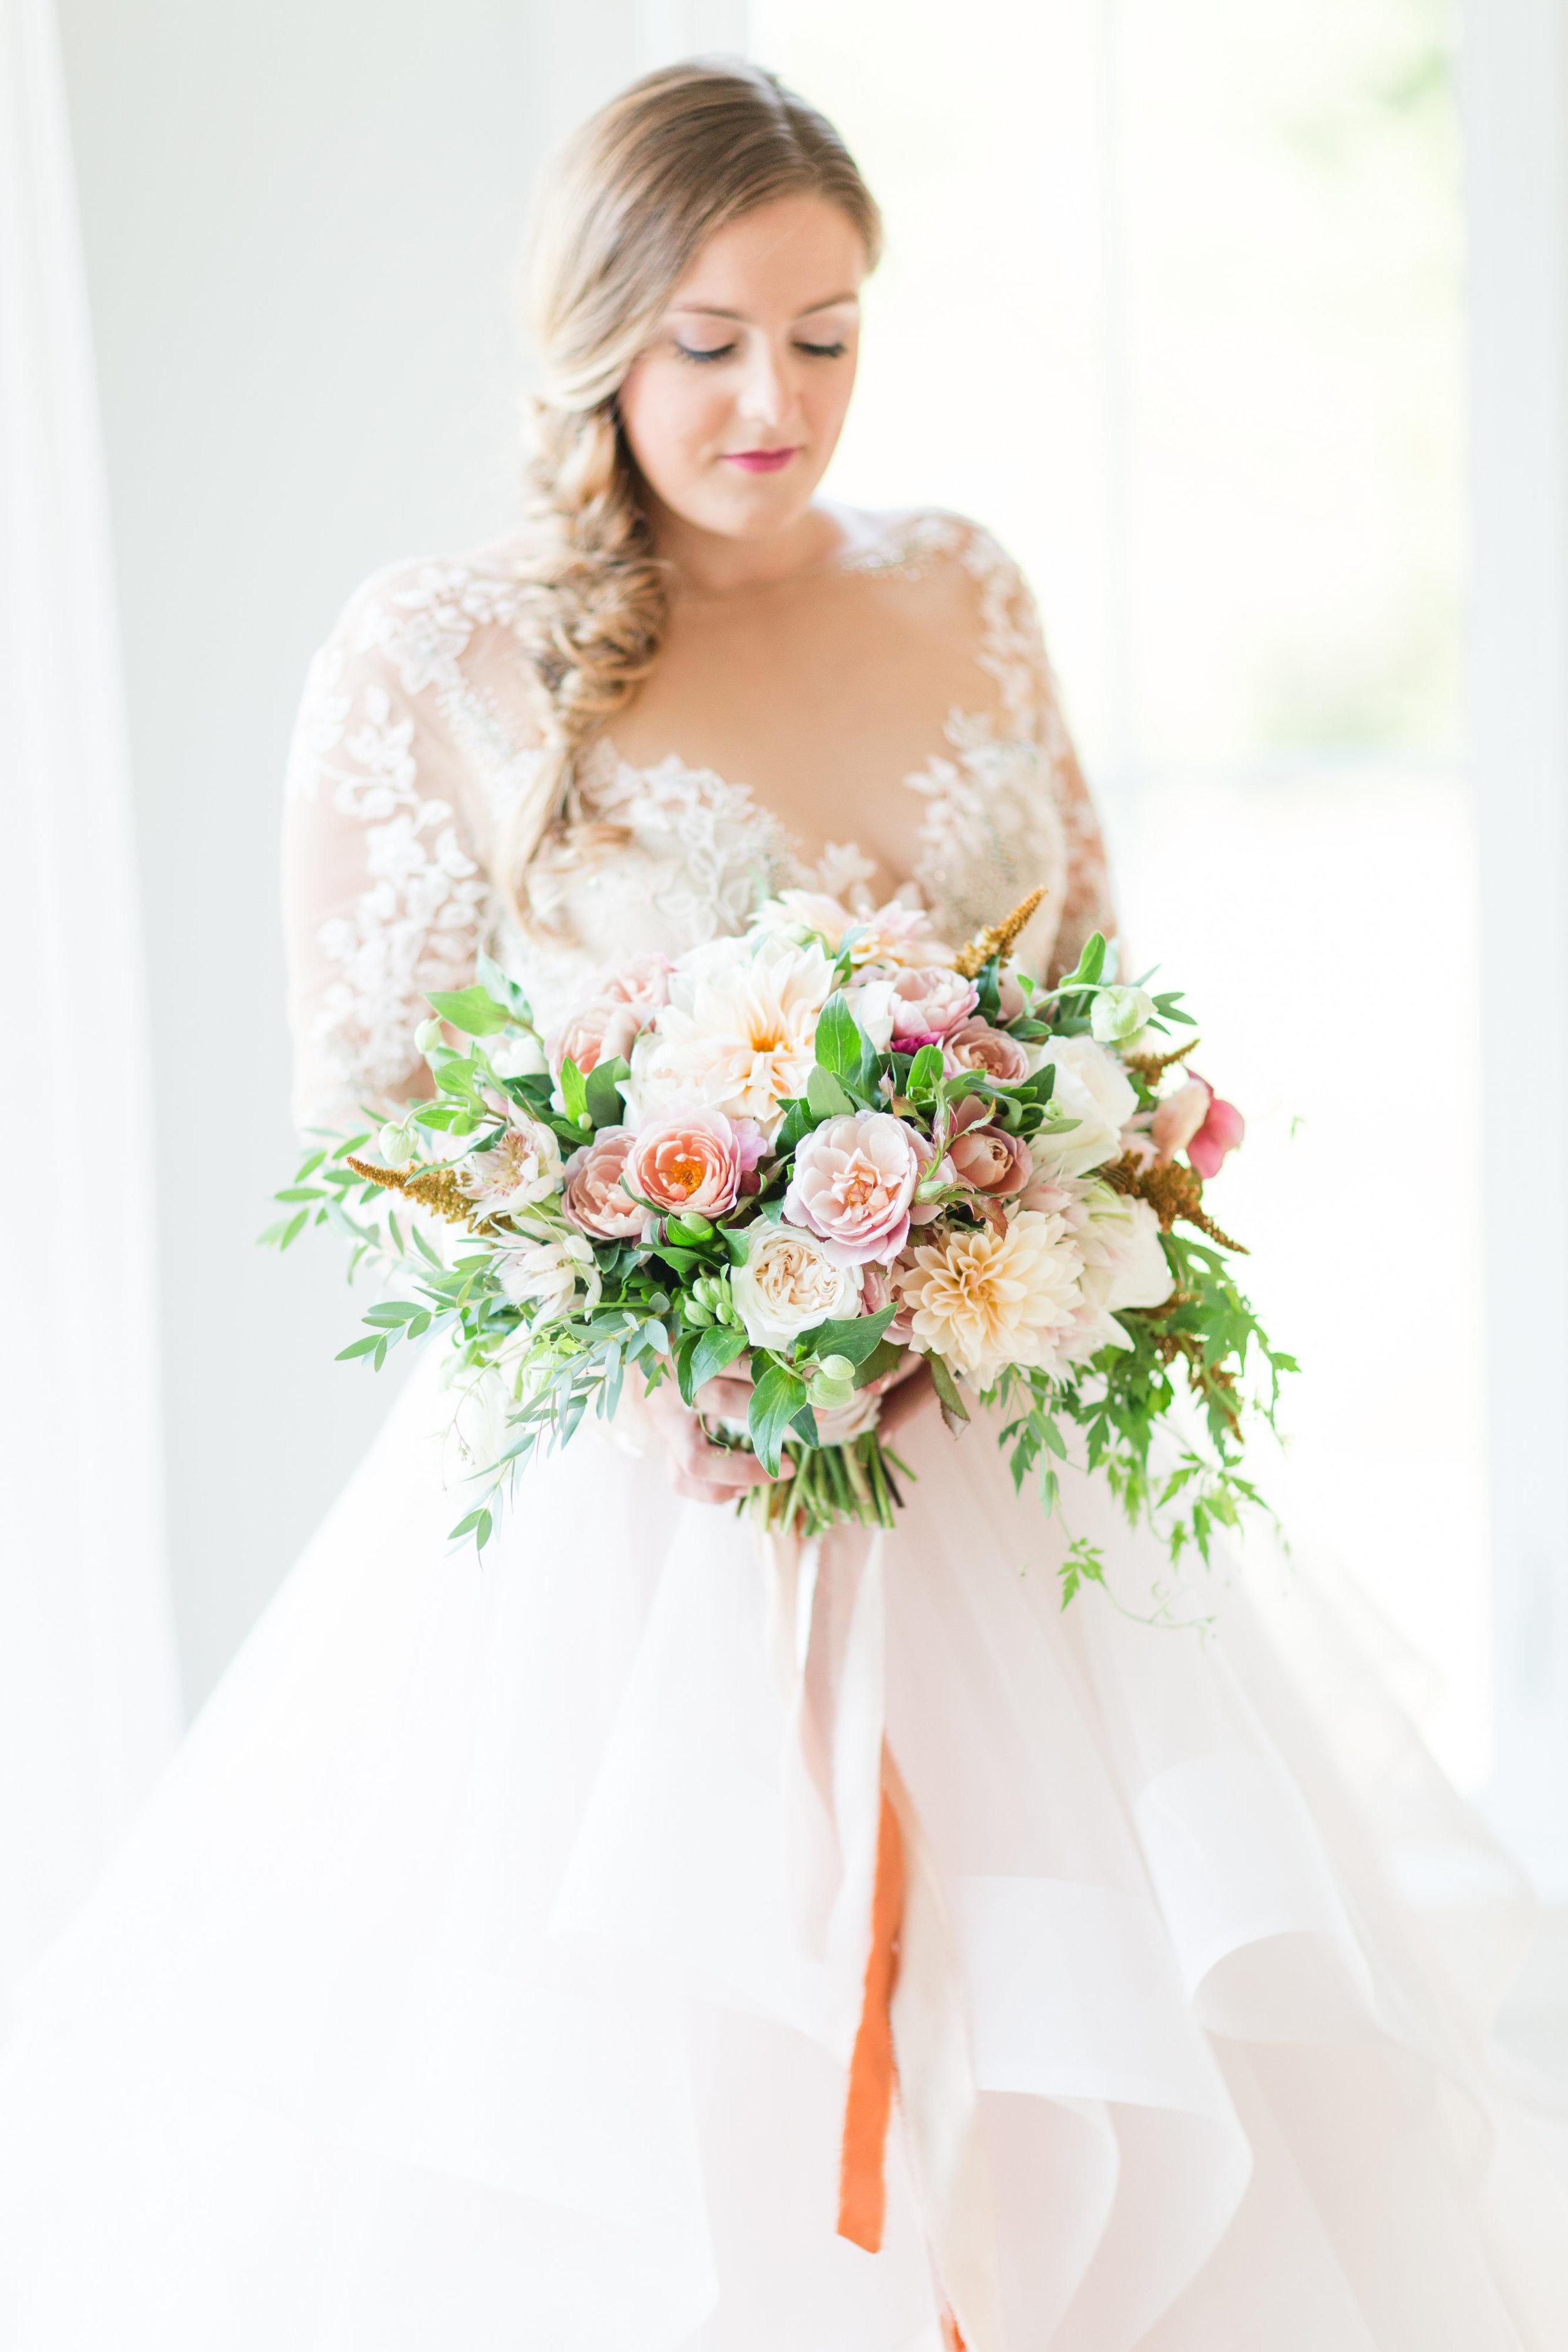 Courtney Inghram Katelyn James Photography Workshop Richmond Virginia Wedding FloristCourtney Inghram Katelyn James Photography Workshop Richmond Virginia Wedding Florist